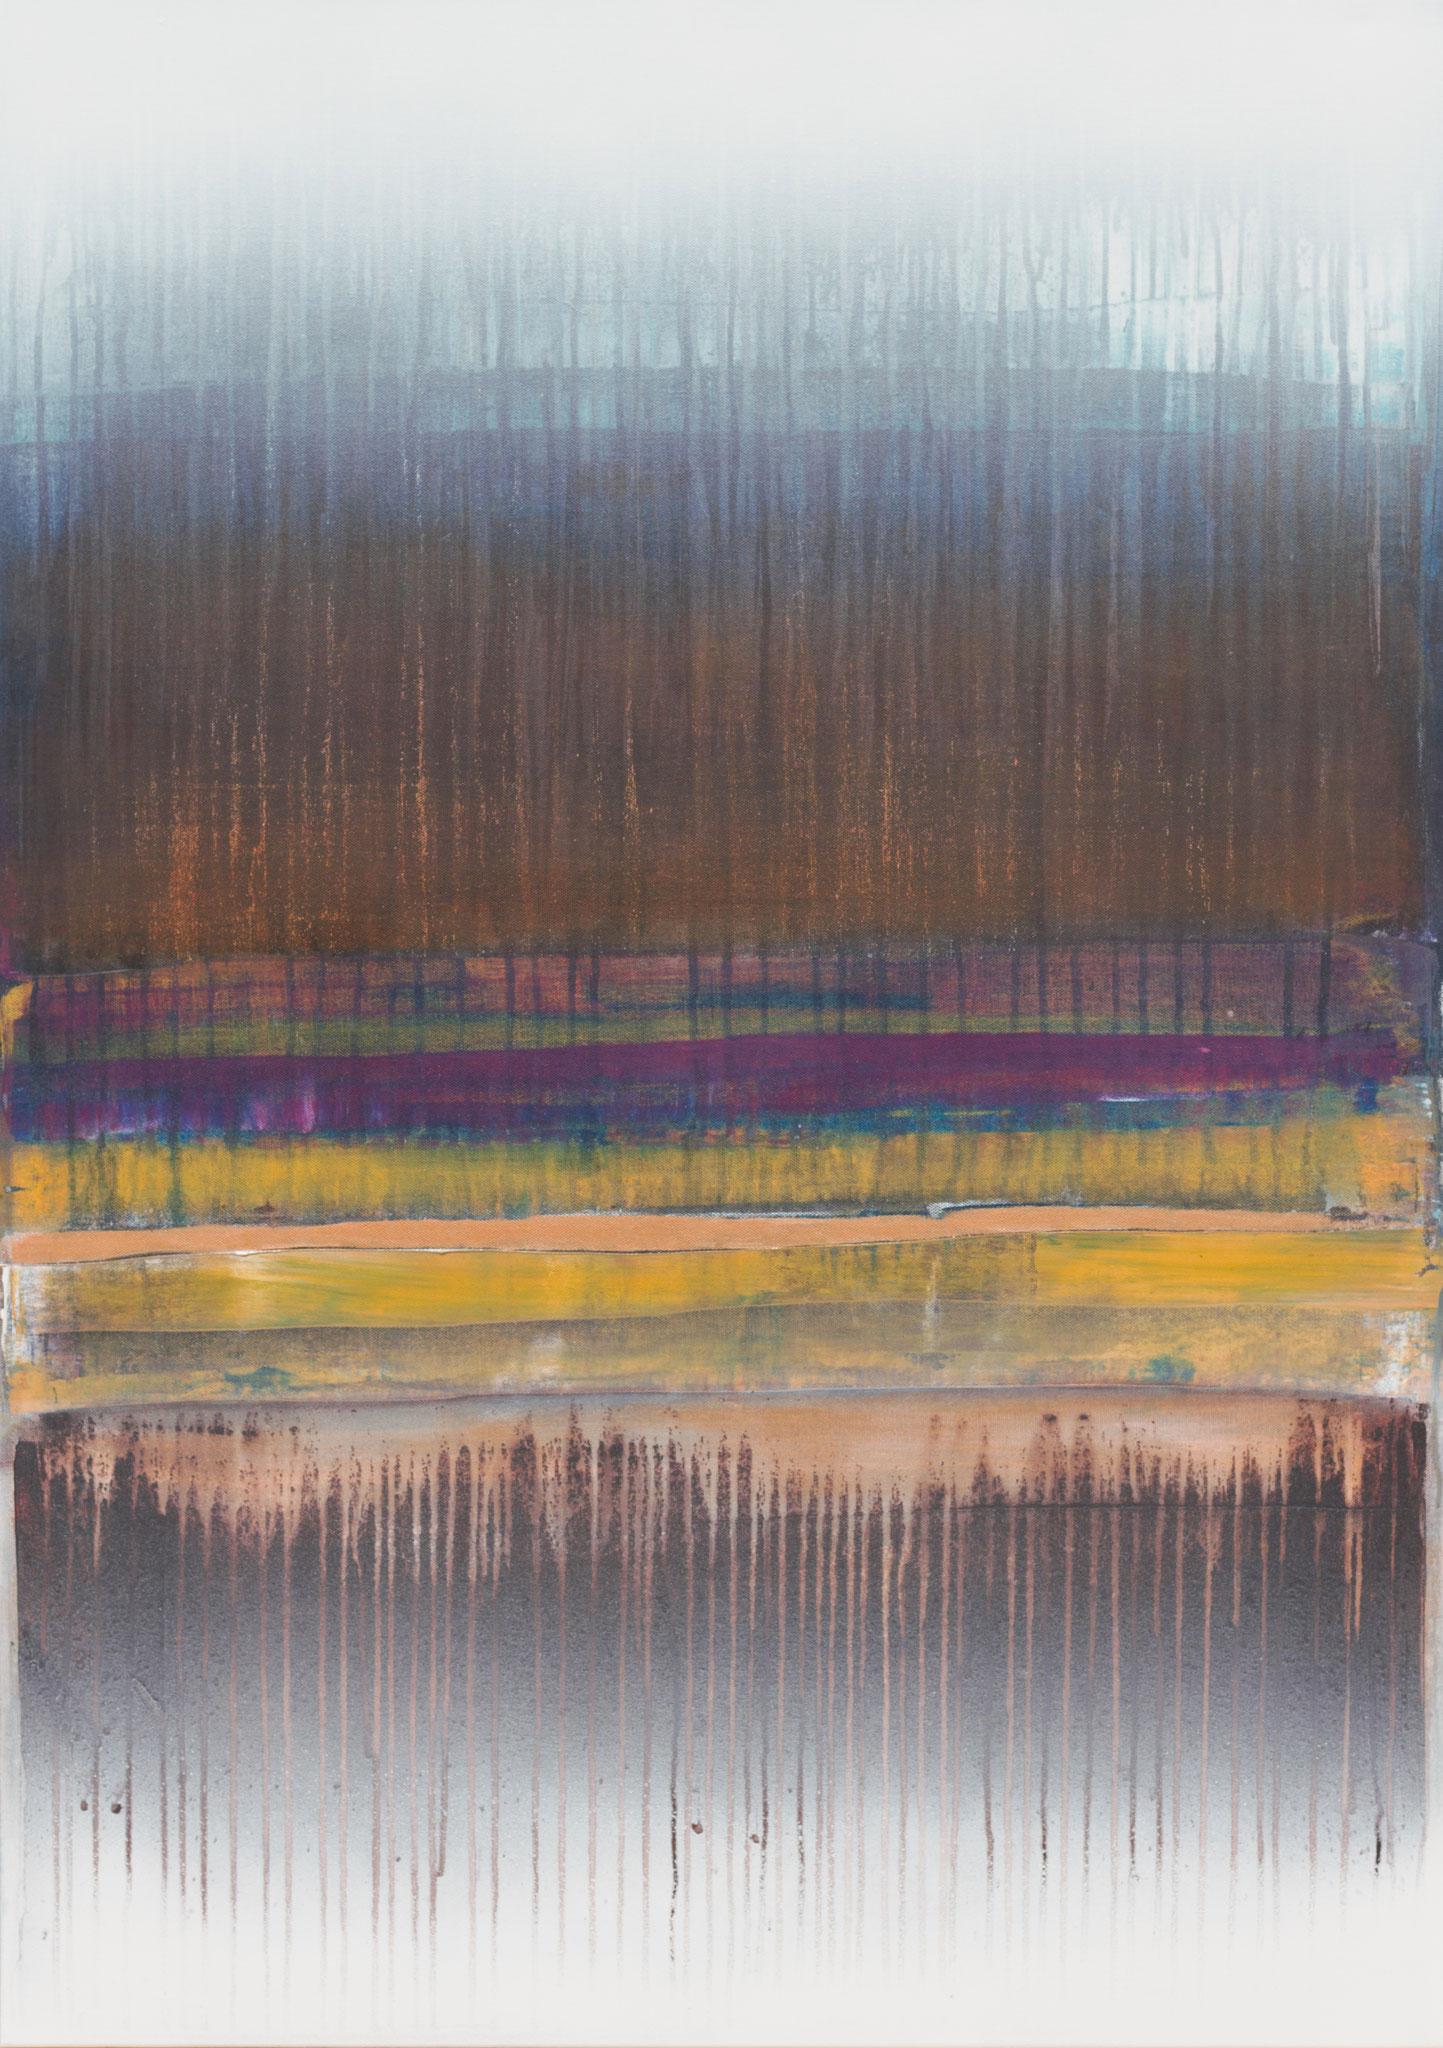 No. 149 Mischtechnik Acryl auf Leinwand 100x70x4 cm (2018)